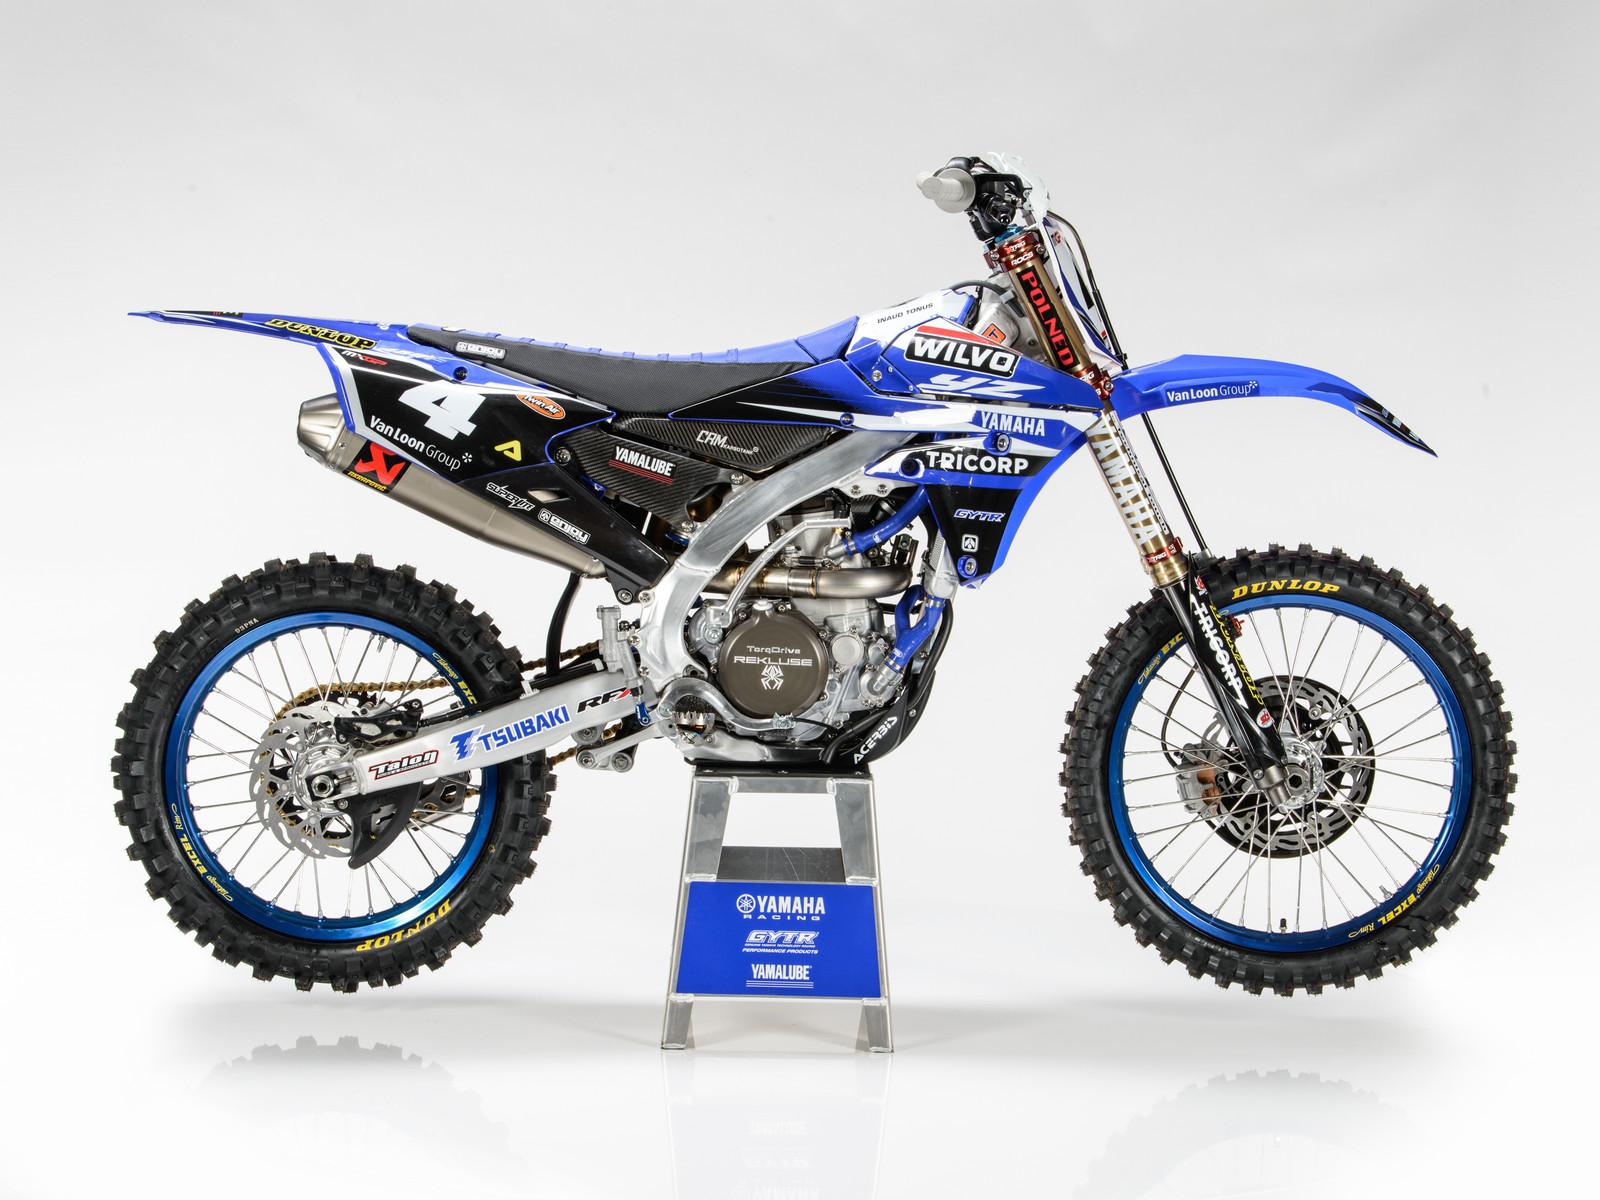 Arnaud Tonus' 2017 WILVO Yamaha YZ450FM - First Look: 2017 Monster Energy & Wilvo Yamaha MXGP Teams - Motocross Pictures - Vital MX